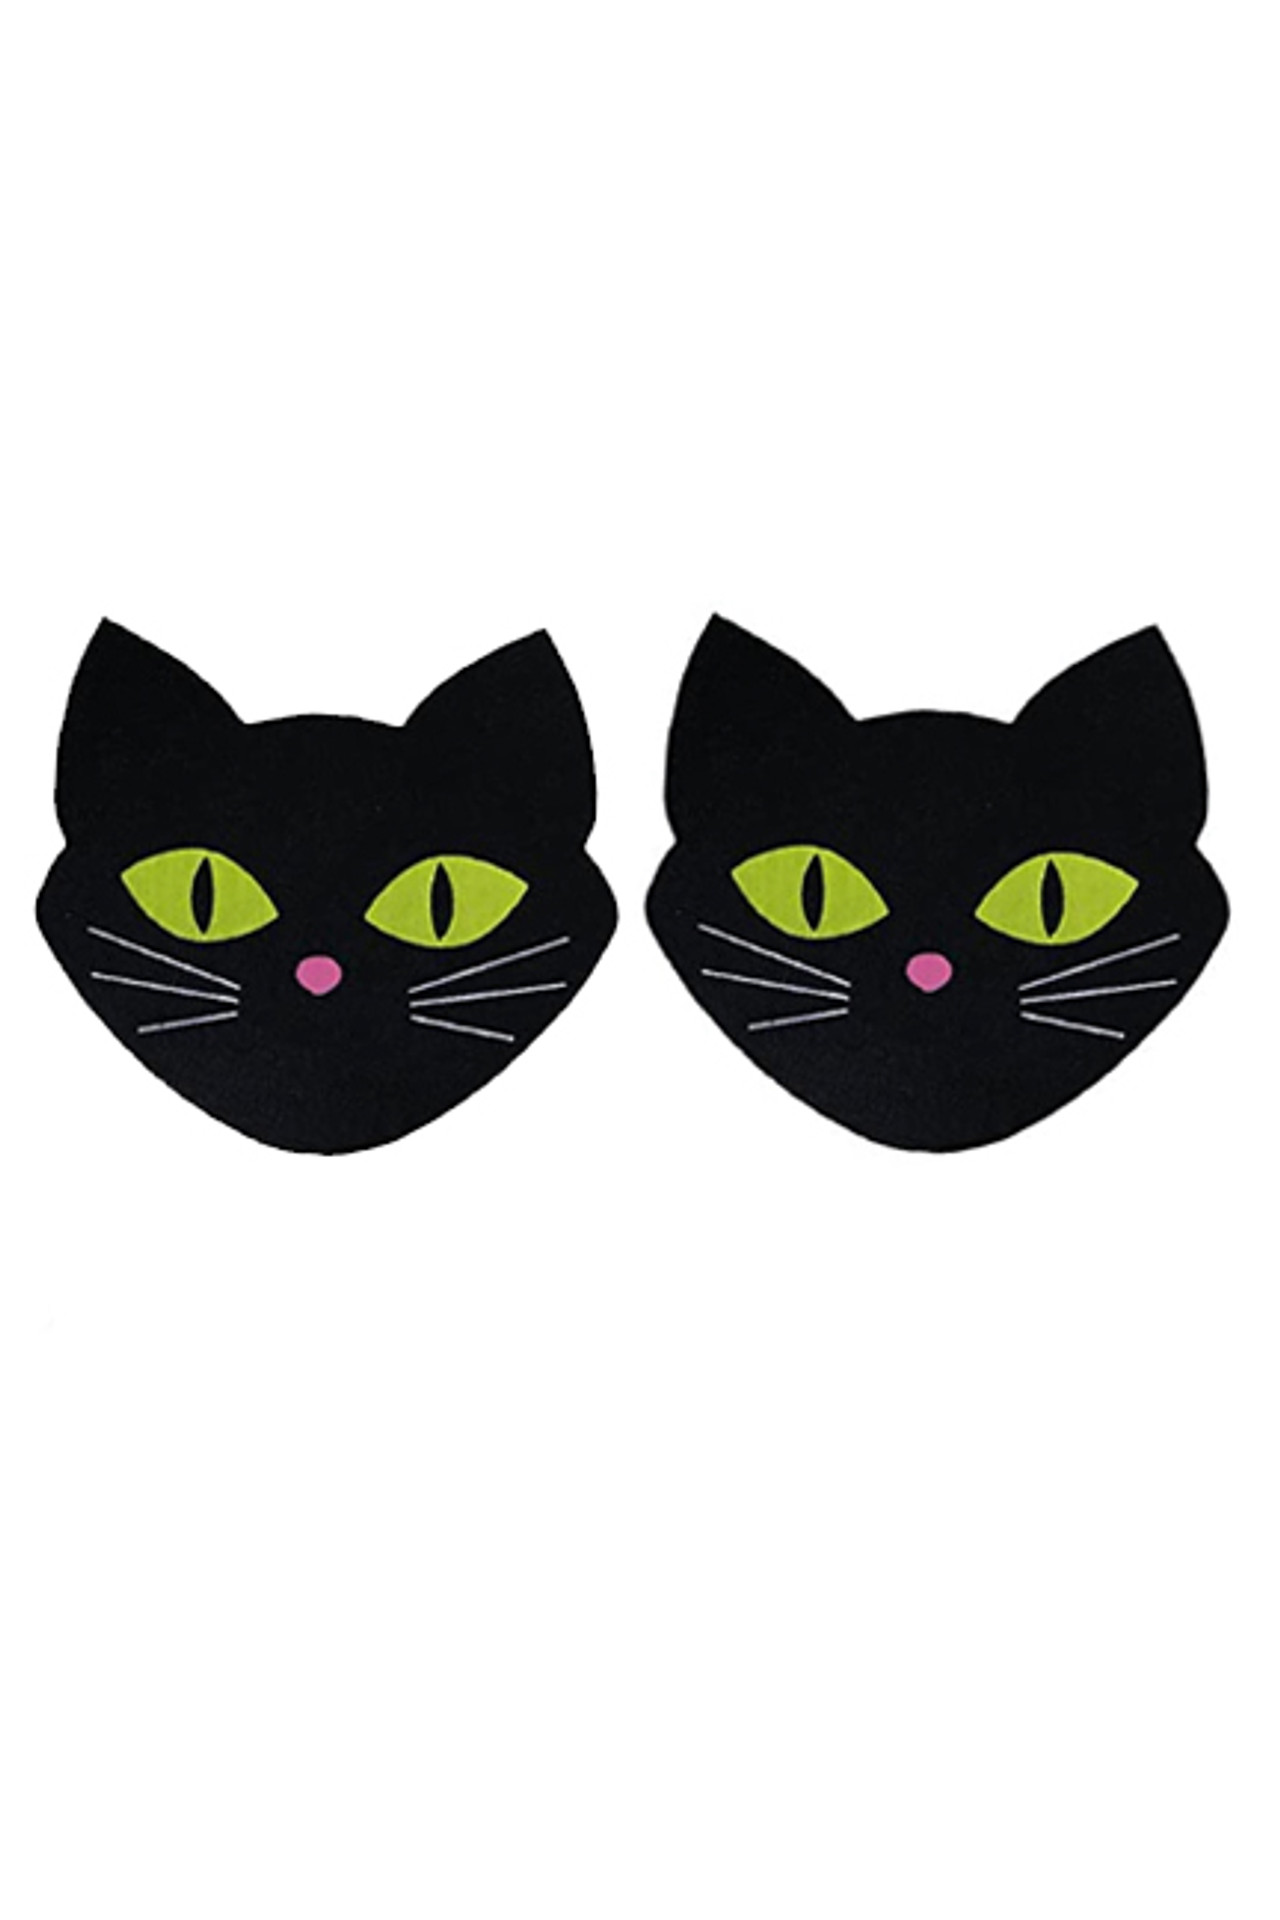 Black Kitty Disposable Nipple Pasties 2 pairs